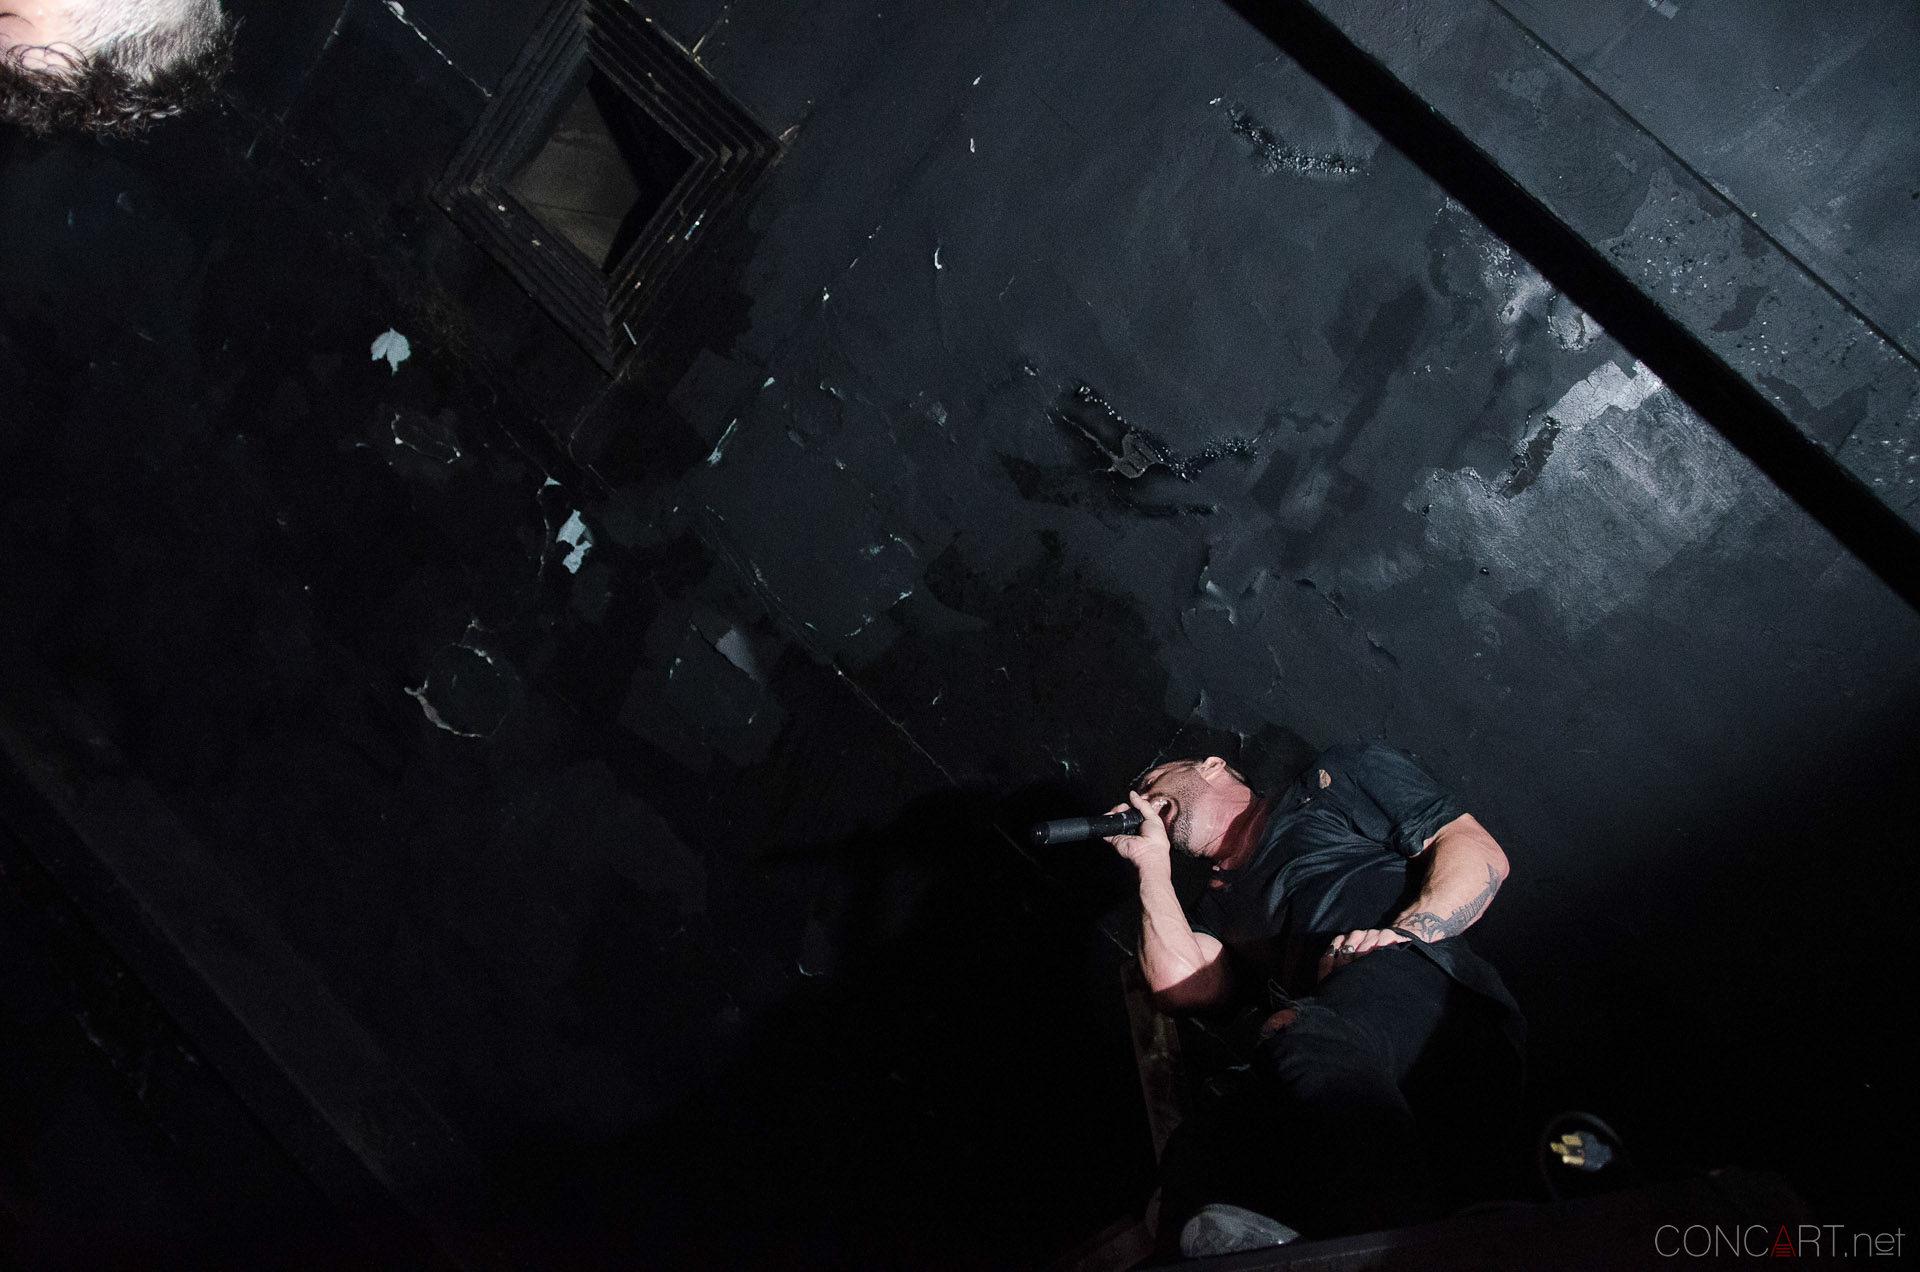 dillinger_escape_plan_live_emerson_theater_indianapolis_2013-13